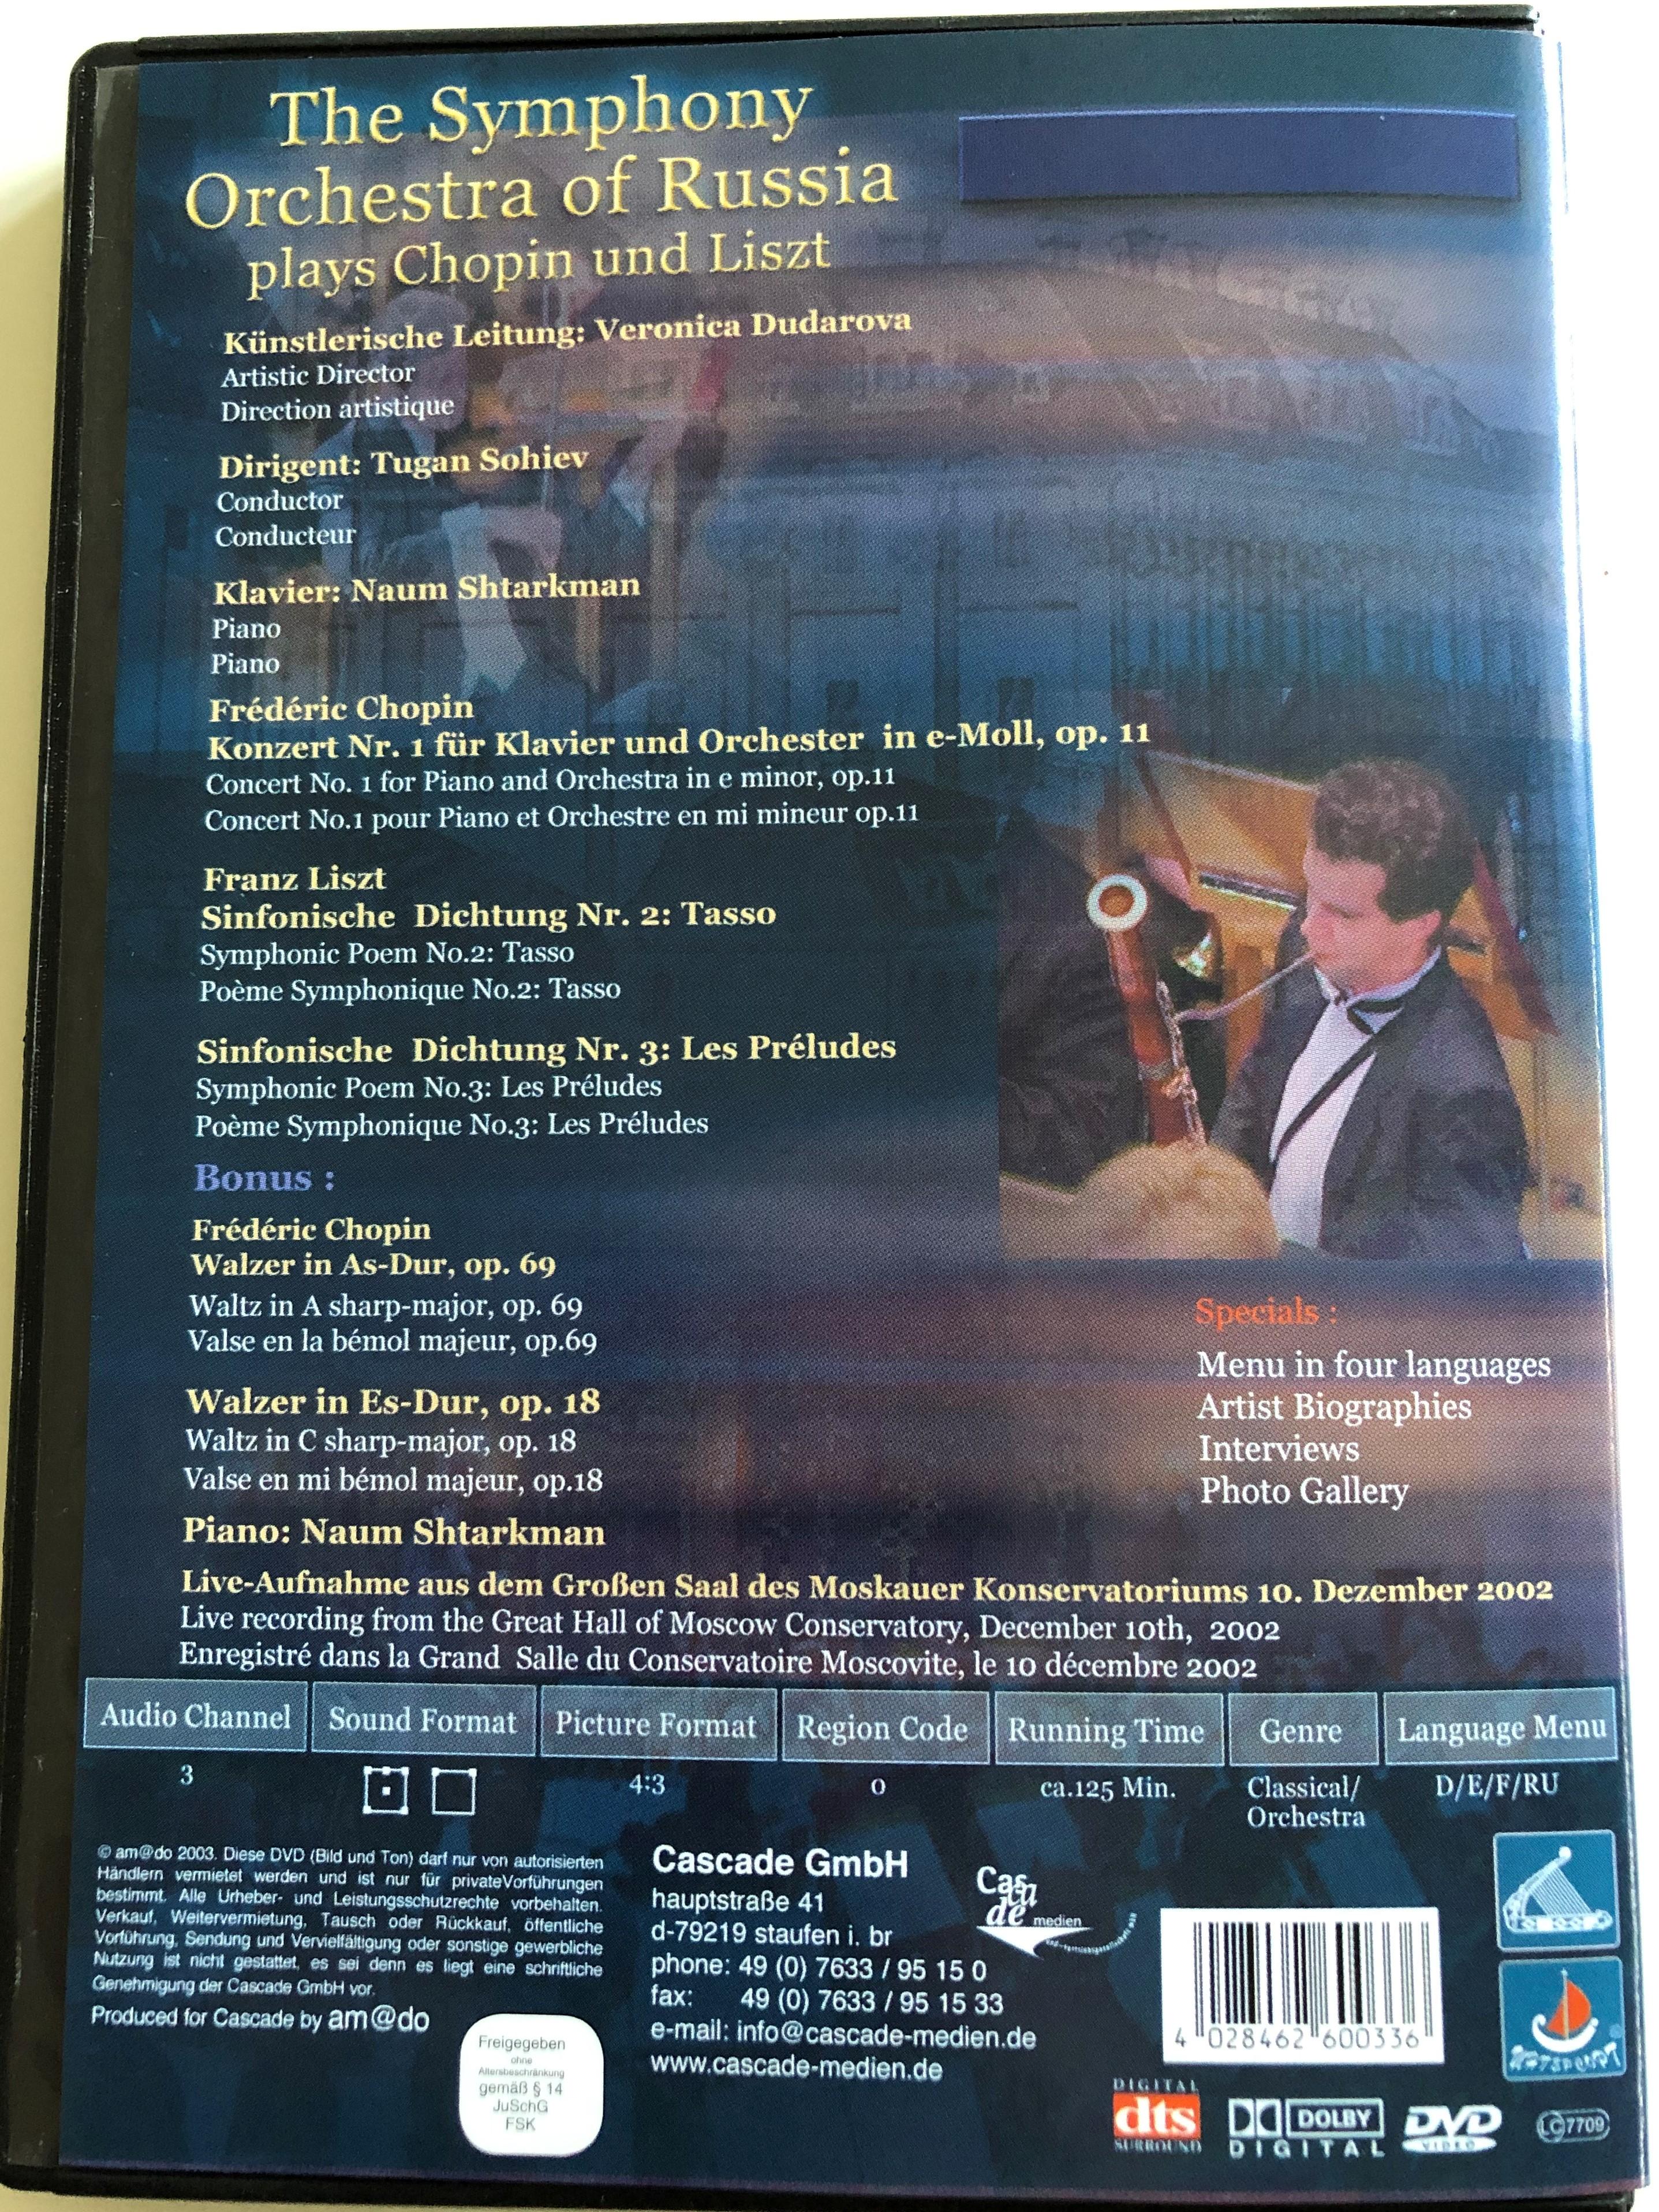 the-symphony-orchestra-of-russia-plays-chopin-und-liszt-dvd-conducted-by-tugan-sohiev-naum-shtarkman-piano-amado-classics-2-.jpg